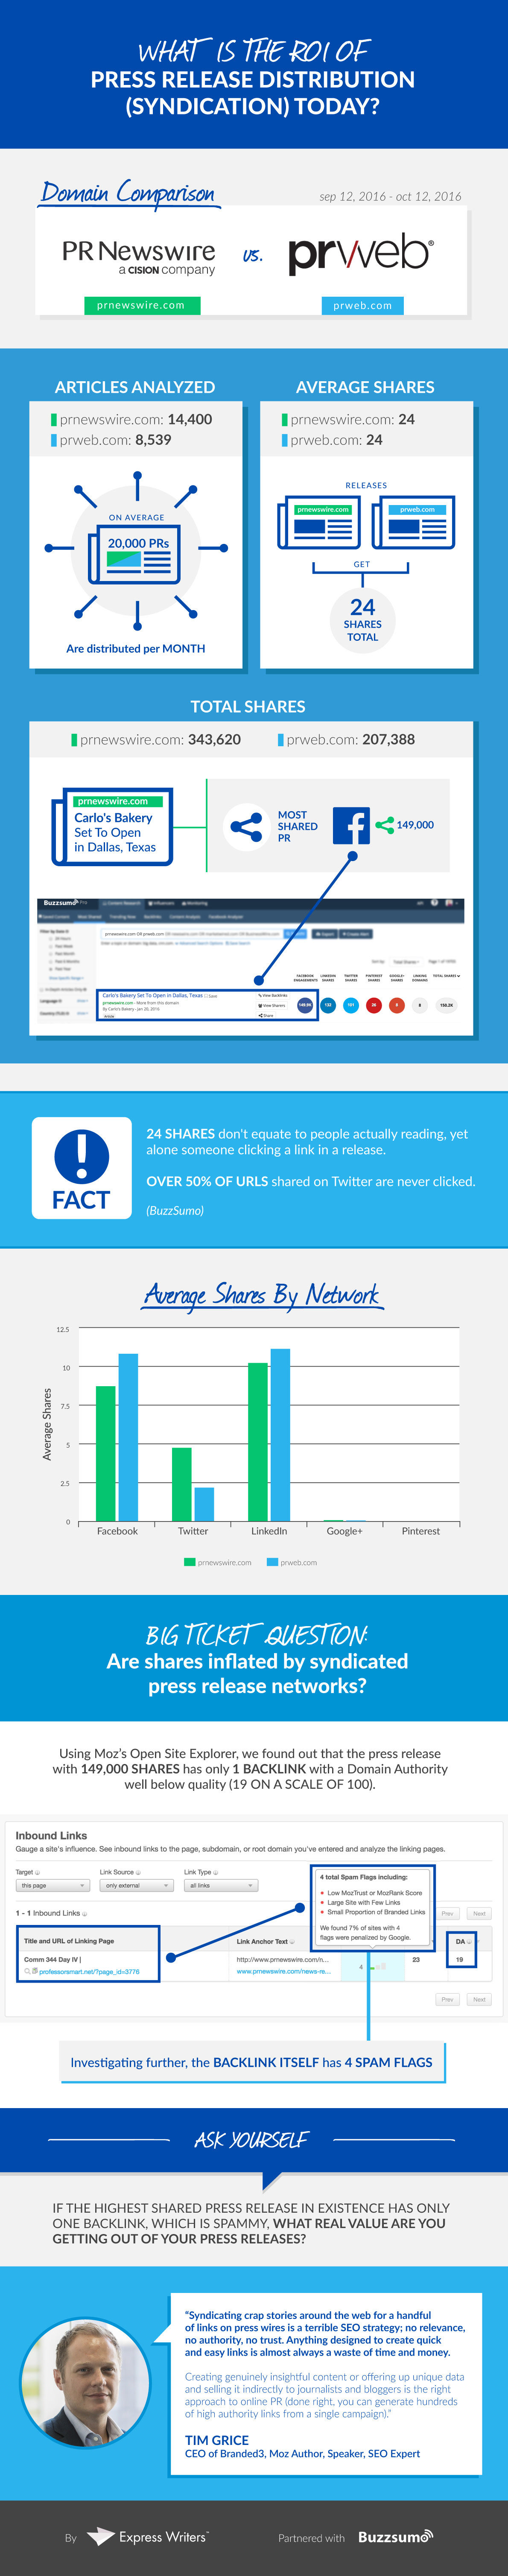 Online Press Release Distribution study